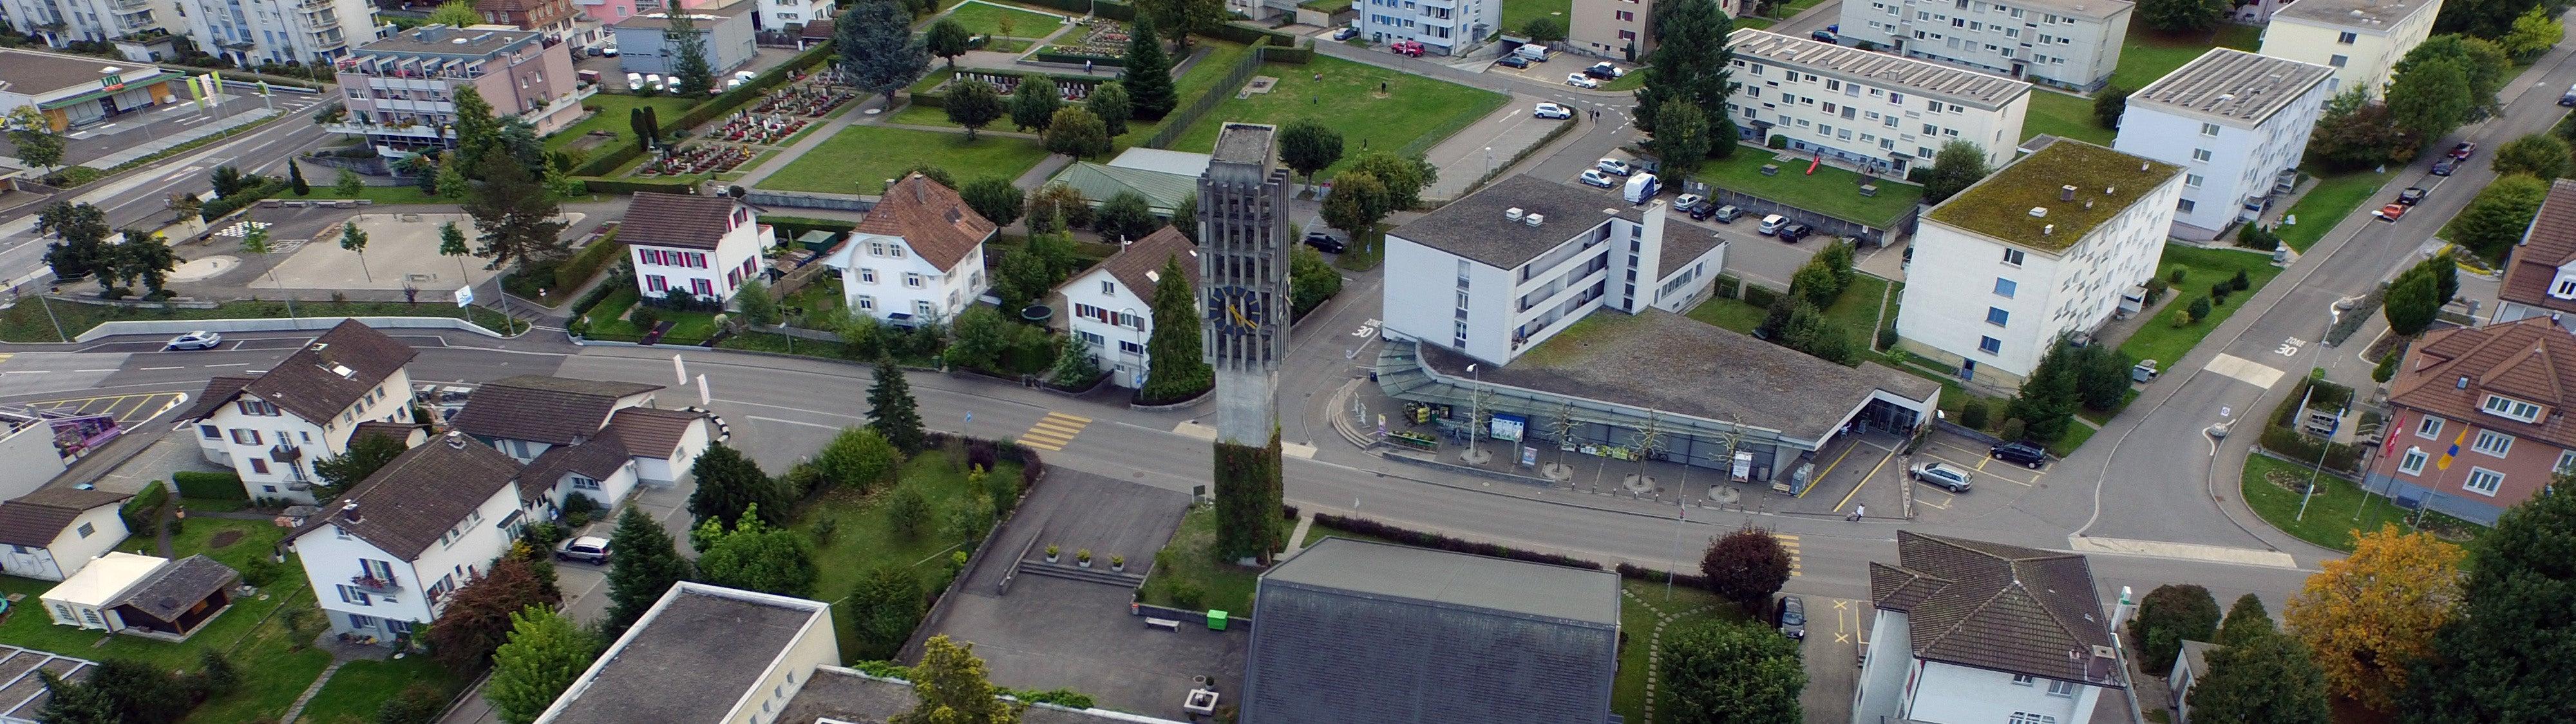 Strengelbach